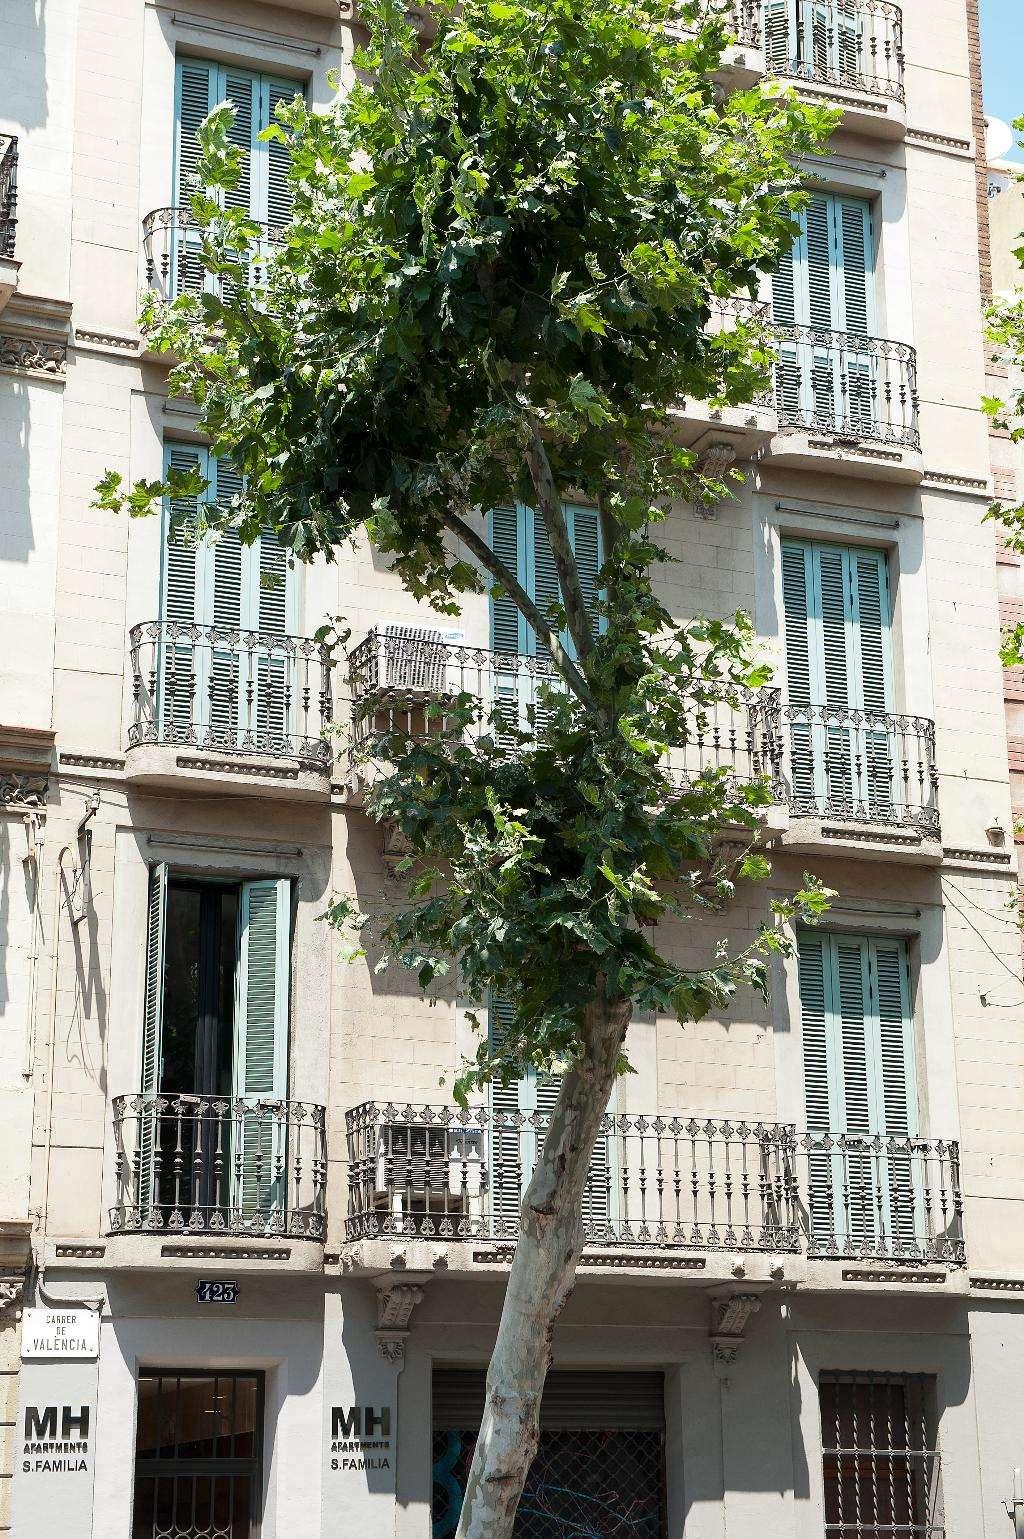 MH Apartments S. Familia